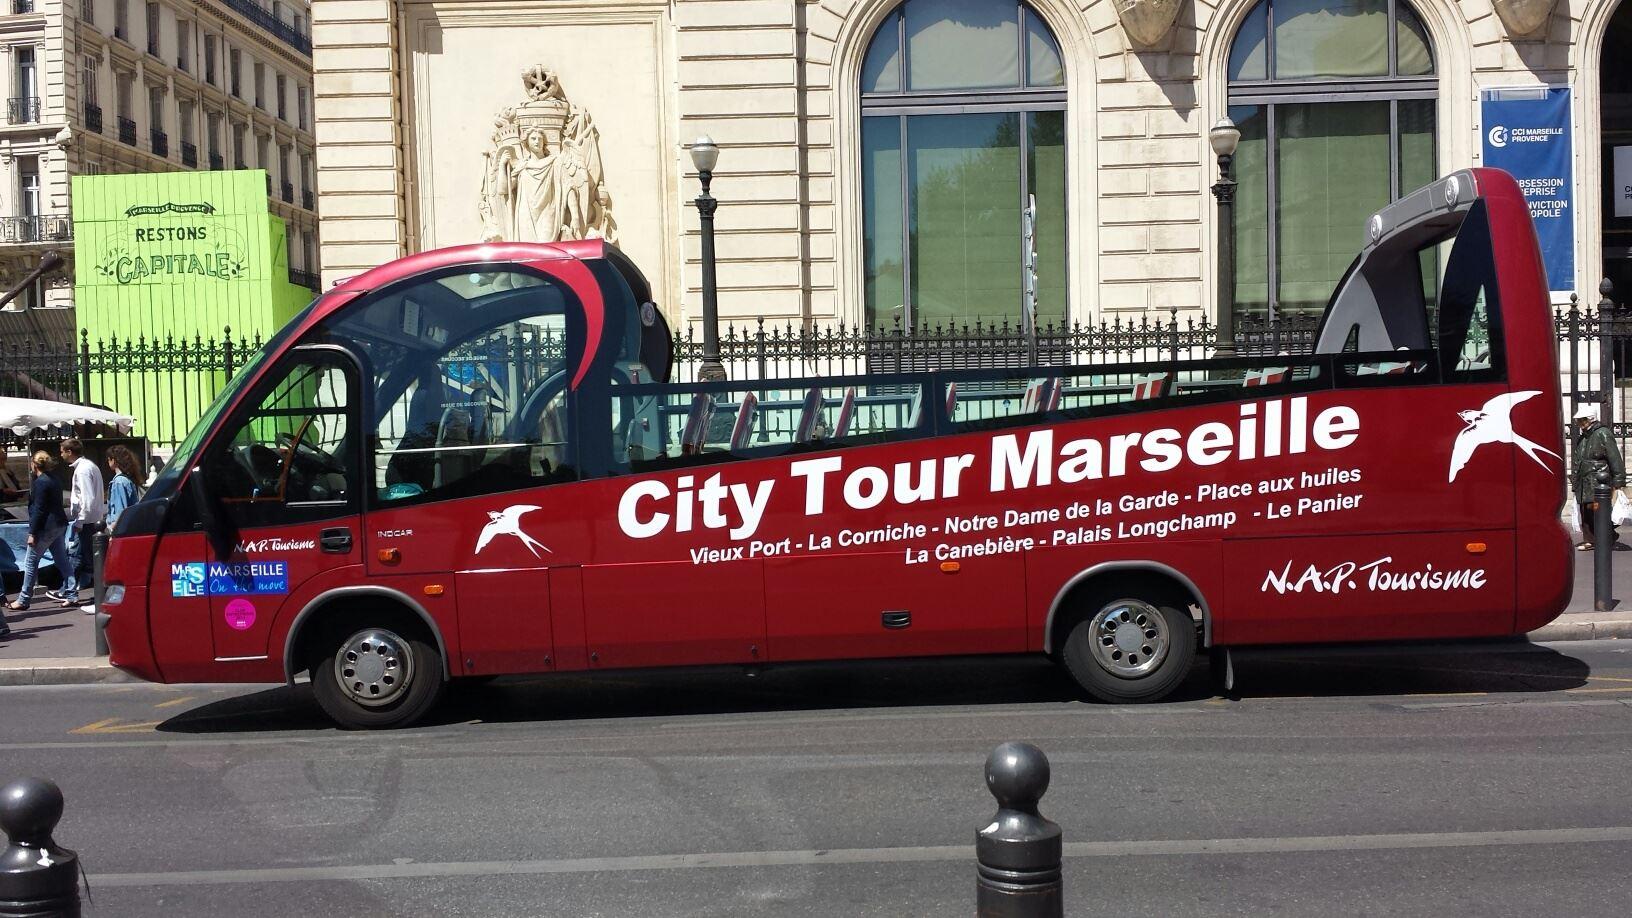 City Tour Marseille